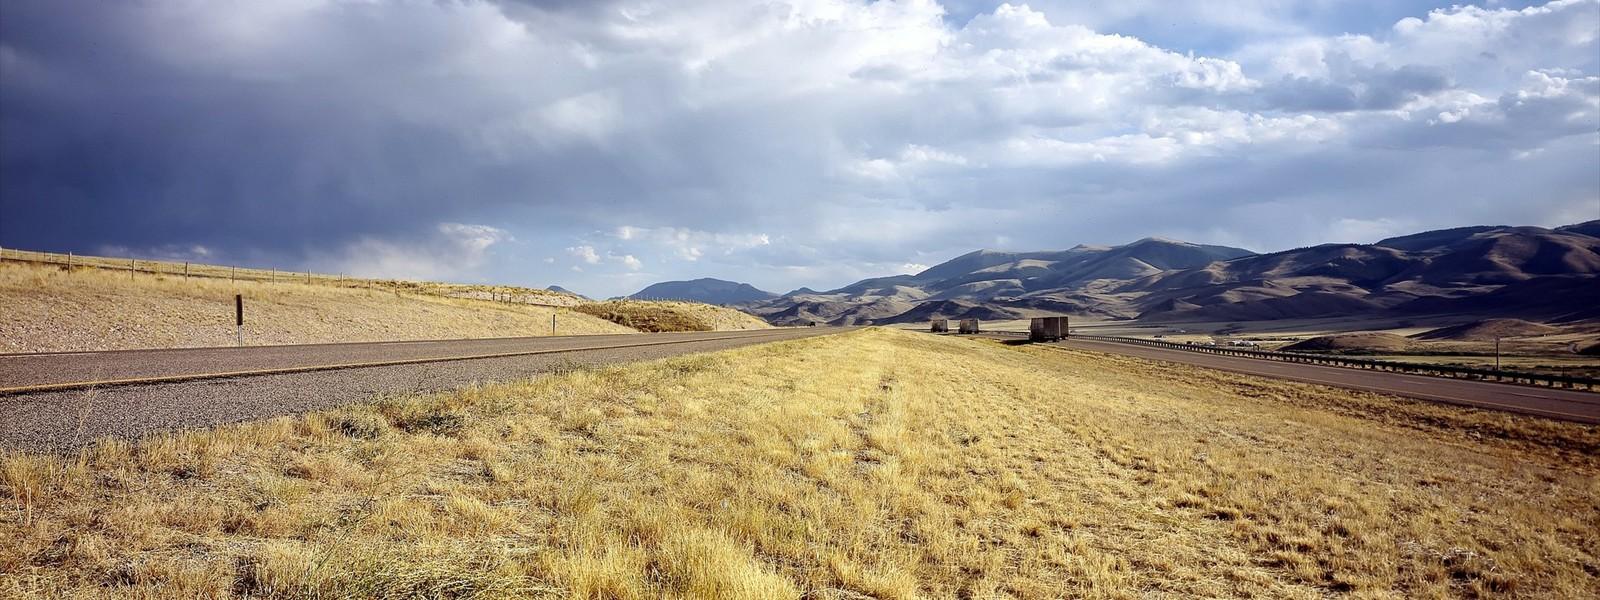 Rural landscape in Idaho : carousel jquery slider